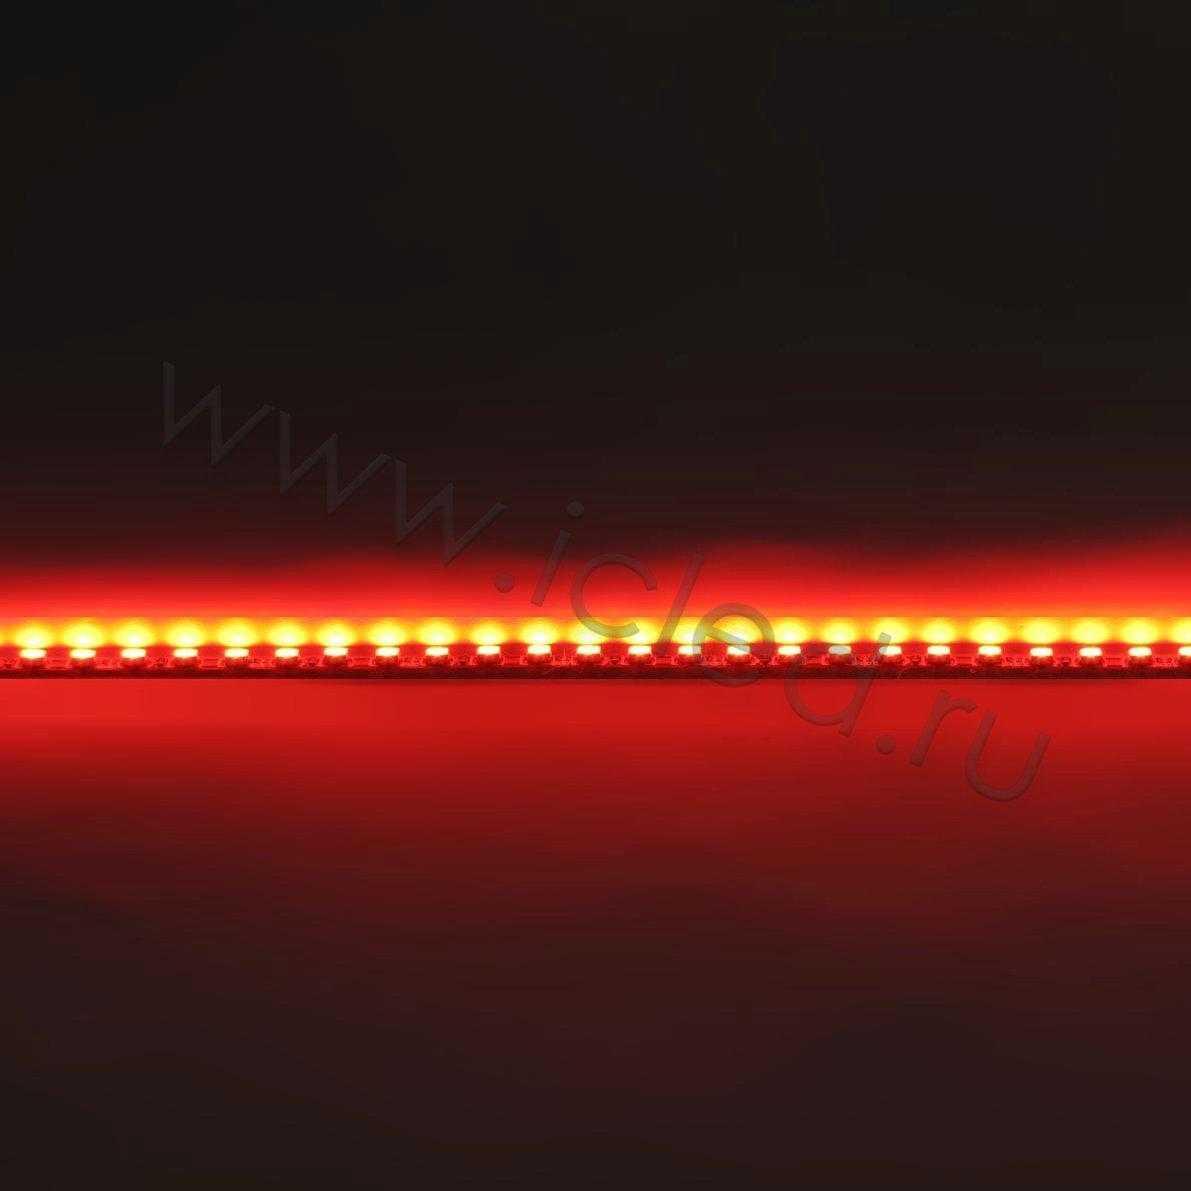 Светодиодная линейка для LCD, 3020, 48led, Red, 12V, IP33